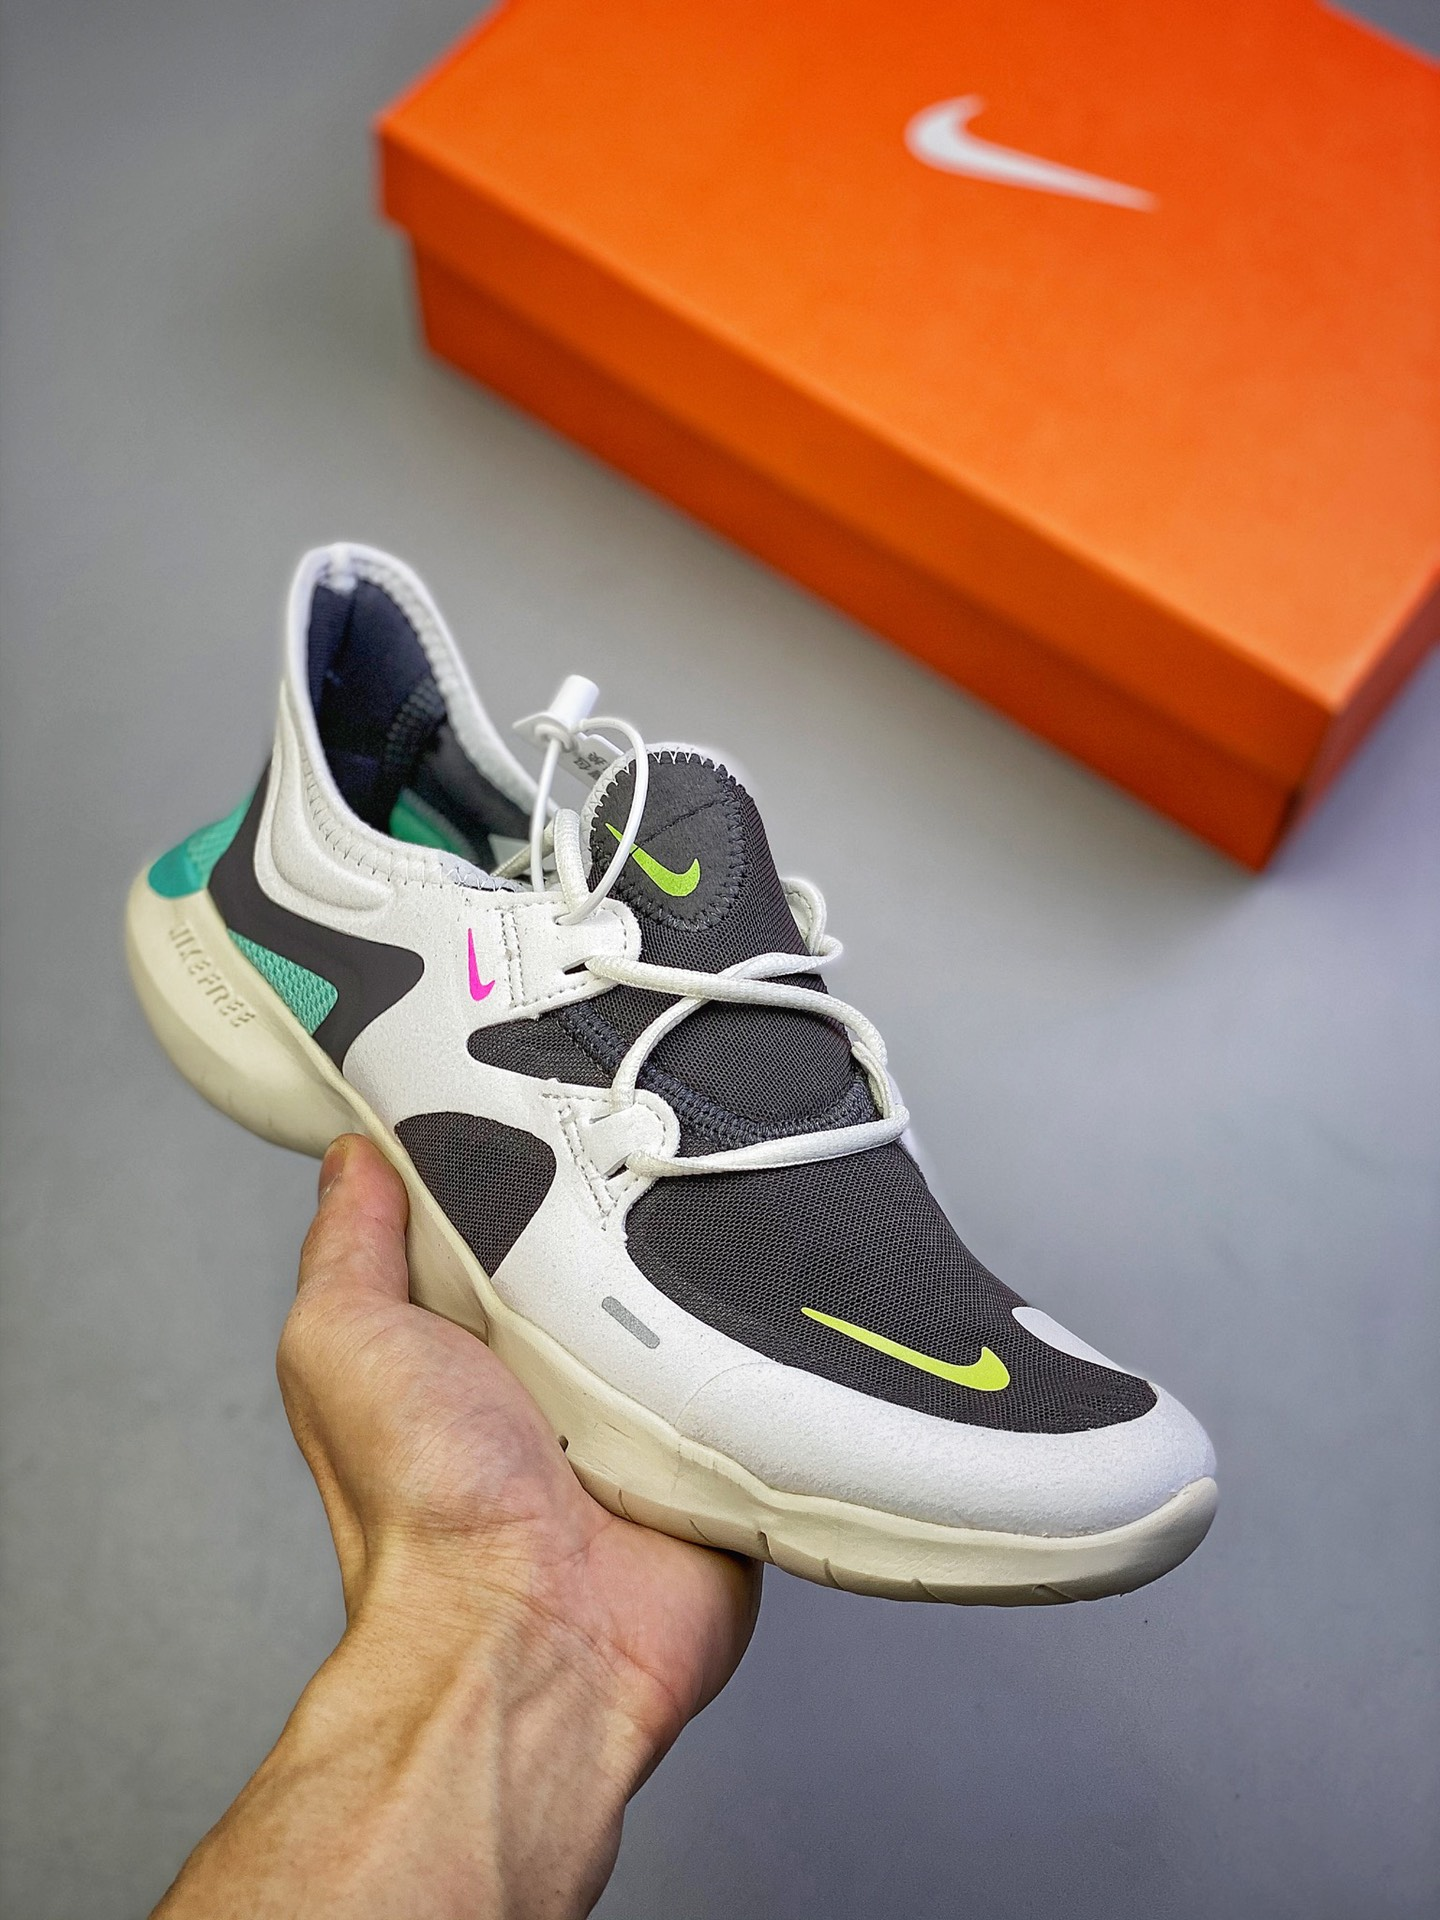 Фото Кроссовки Nike Wmns Free Rn 5.0 - ukrfashion.com.ua